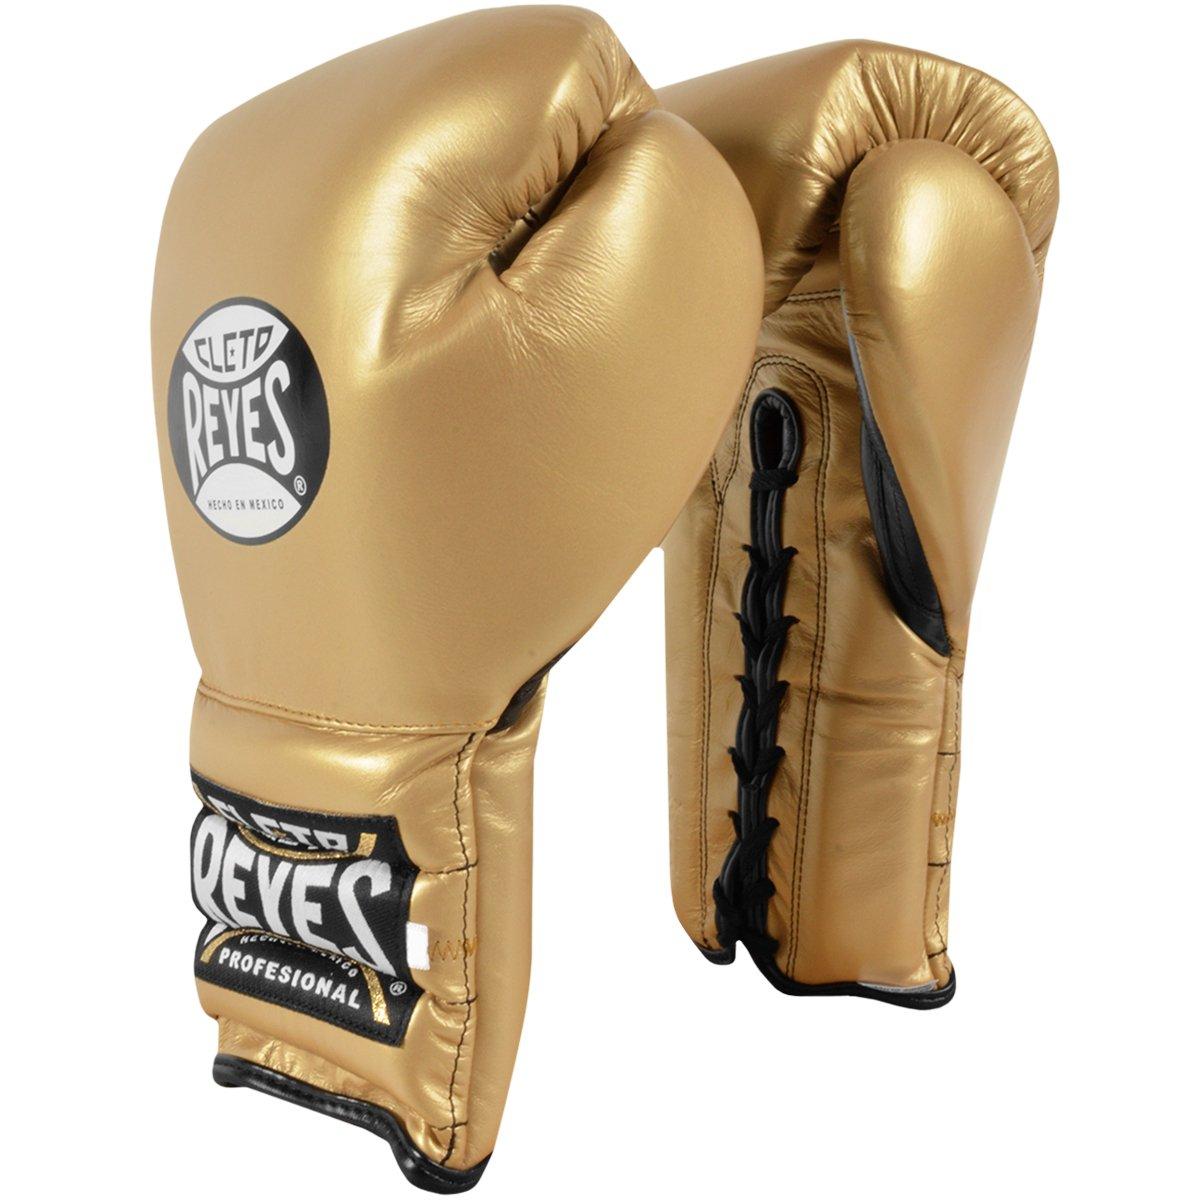 Cleto Reyes 伝統的な編み上げトレーニングボクシンググローブ 14オンス - 純金。